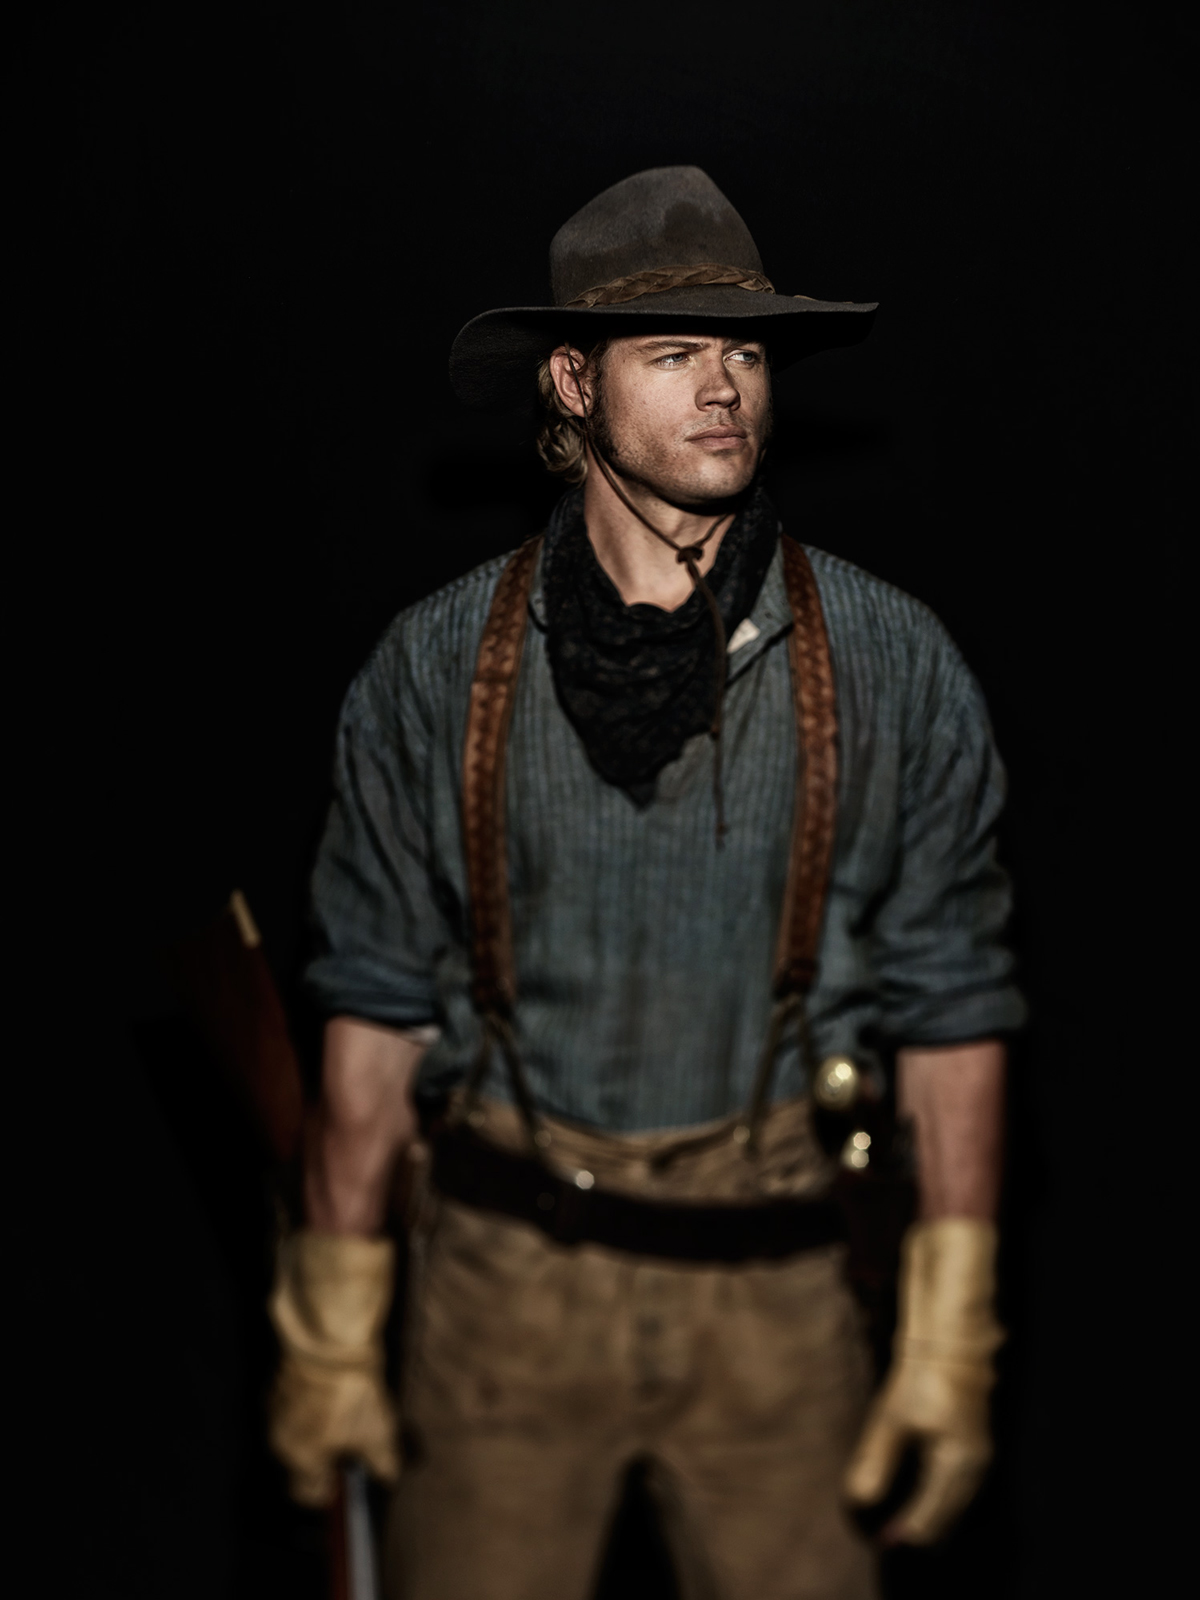 TV_History_TexasRising_KevinLynch-Portrait04.jpg